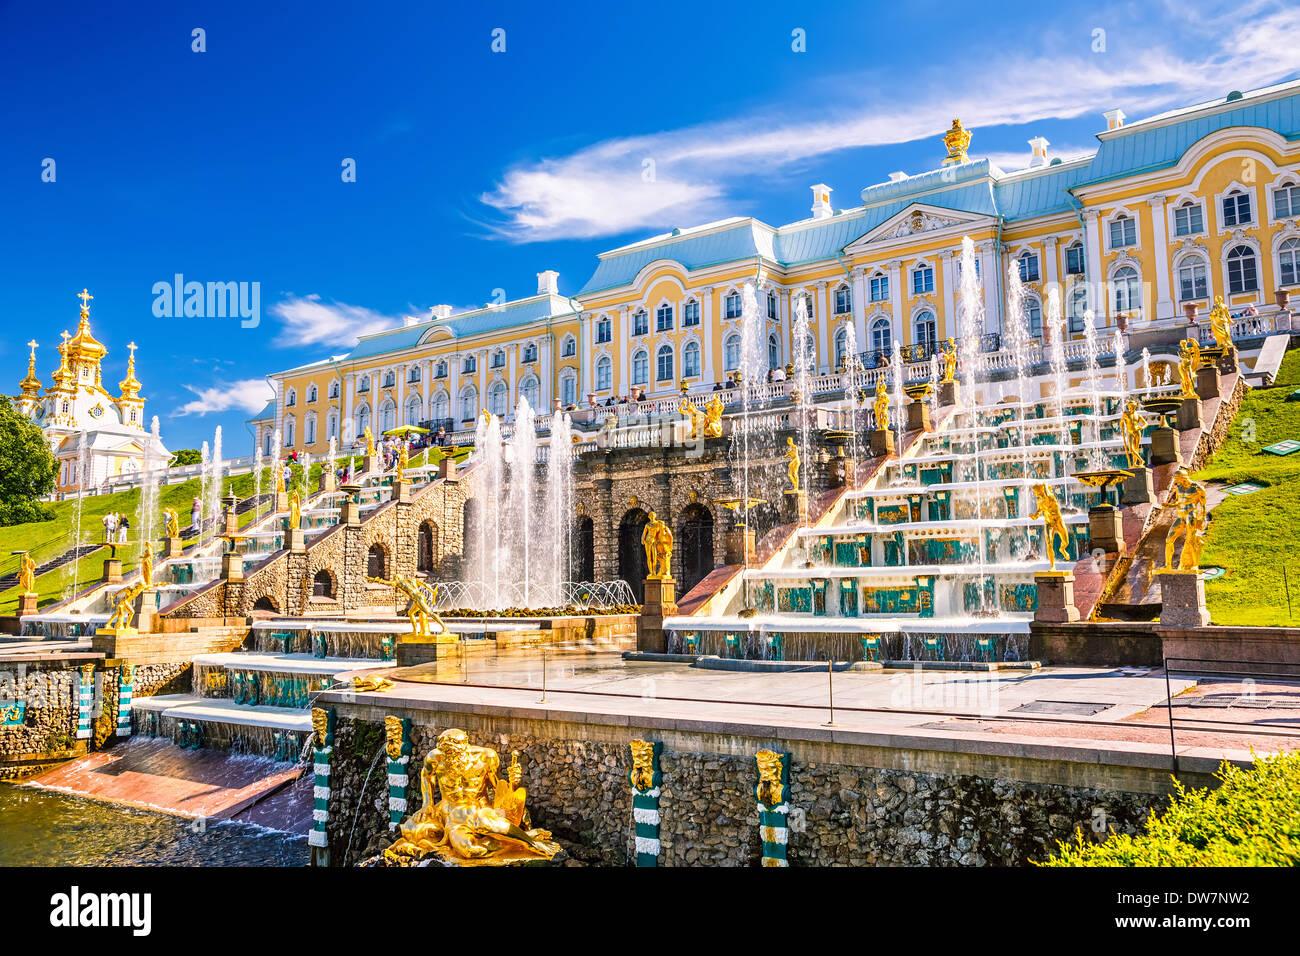 Große Kaskade in Peterhof, St. Petersburg Stockbild